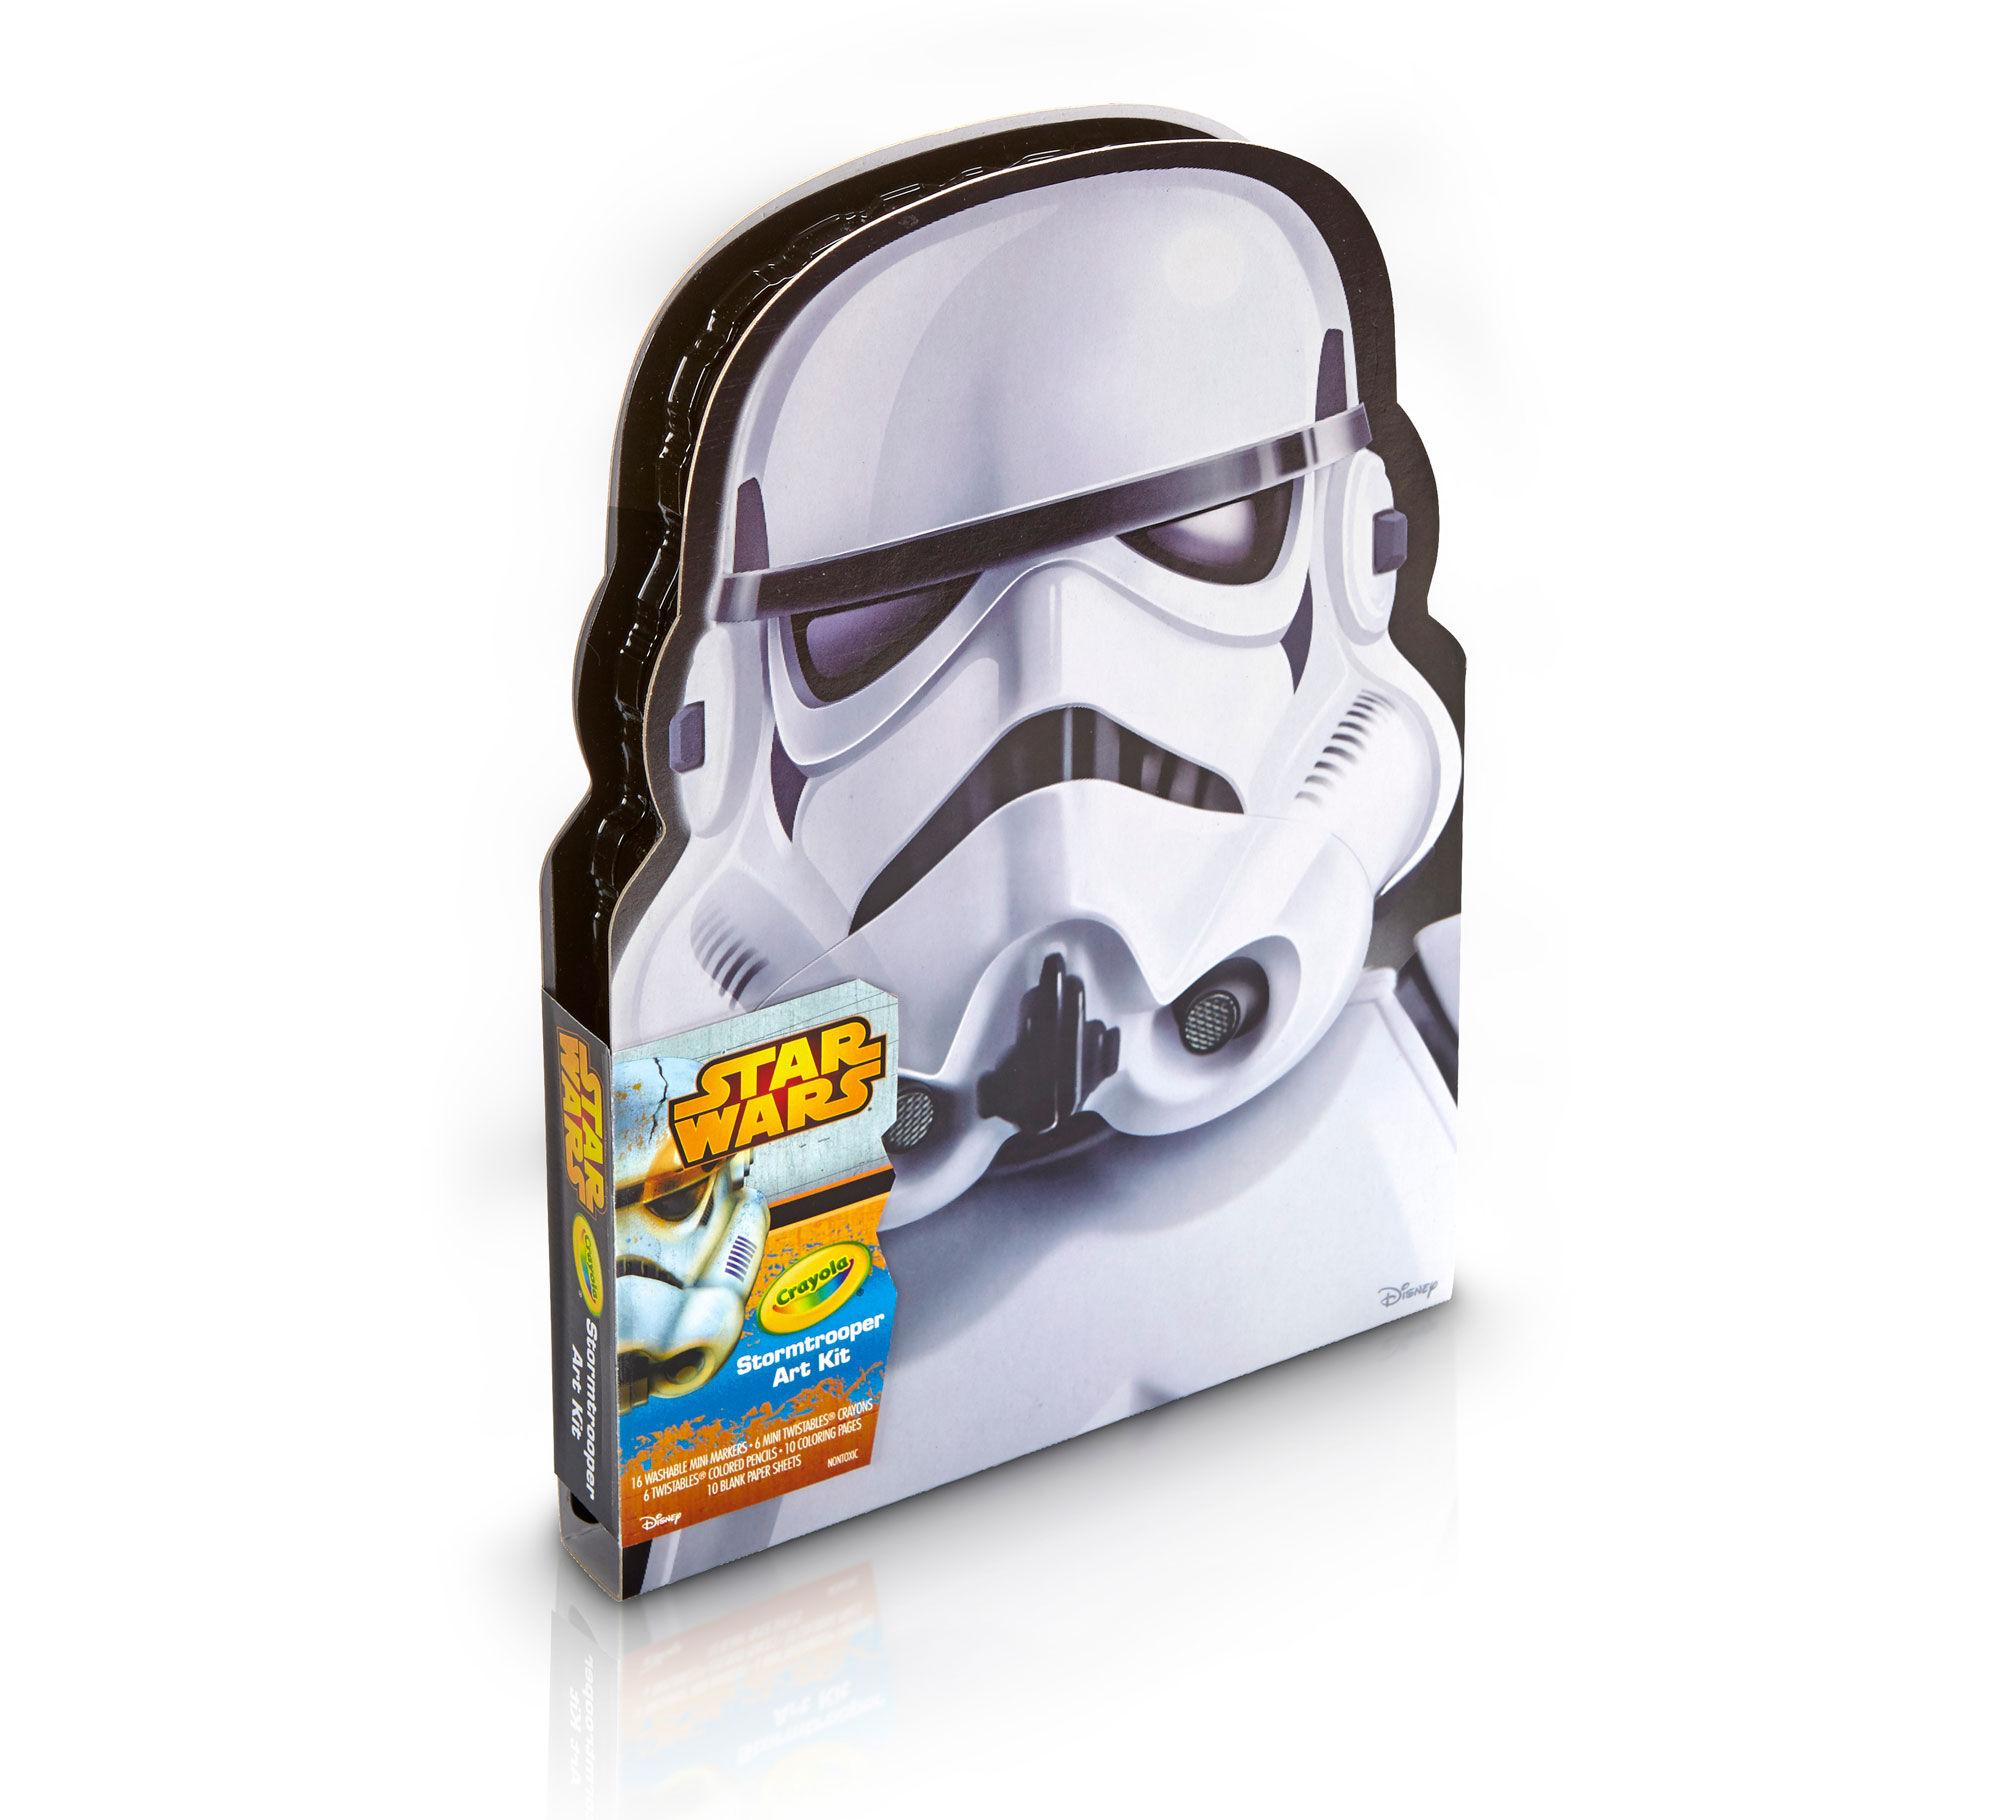 Crayola Storm Trooper Art Case Toy